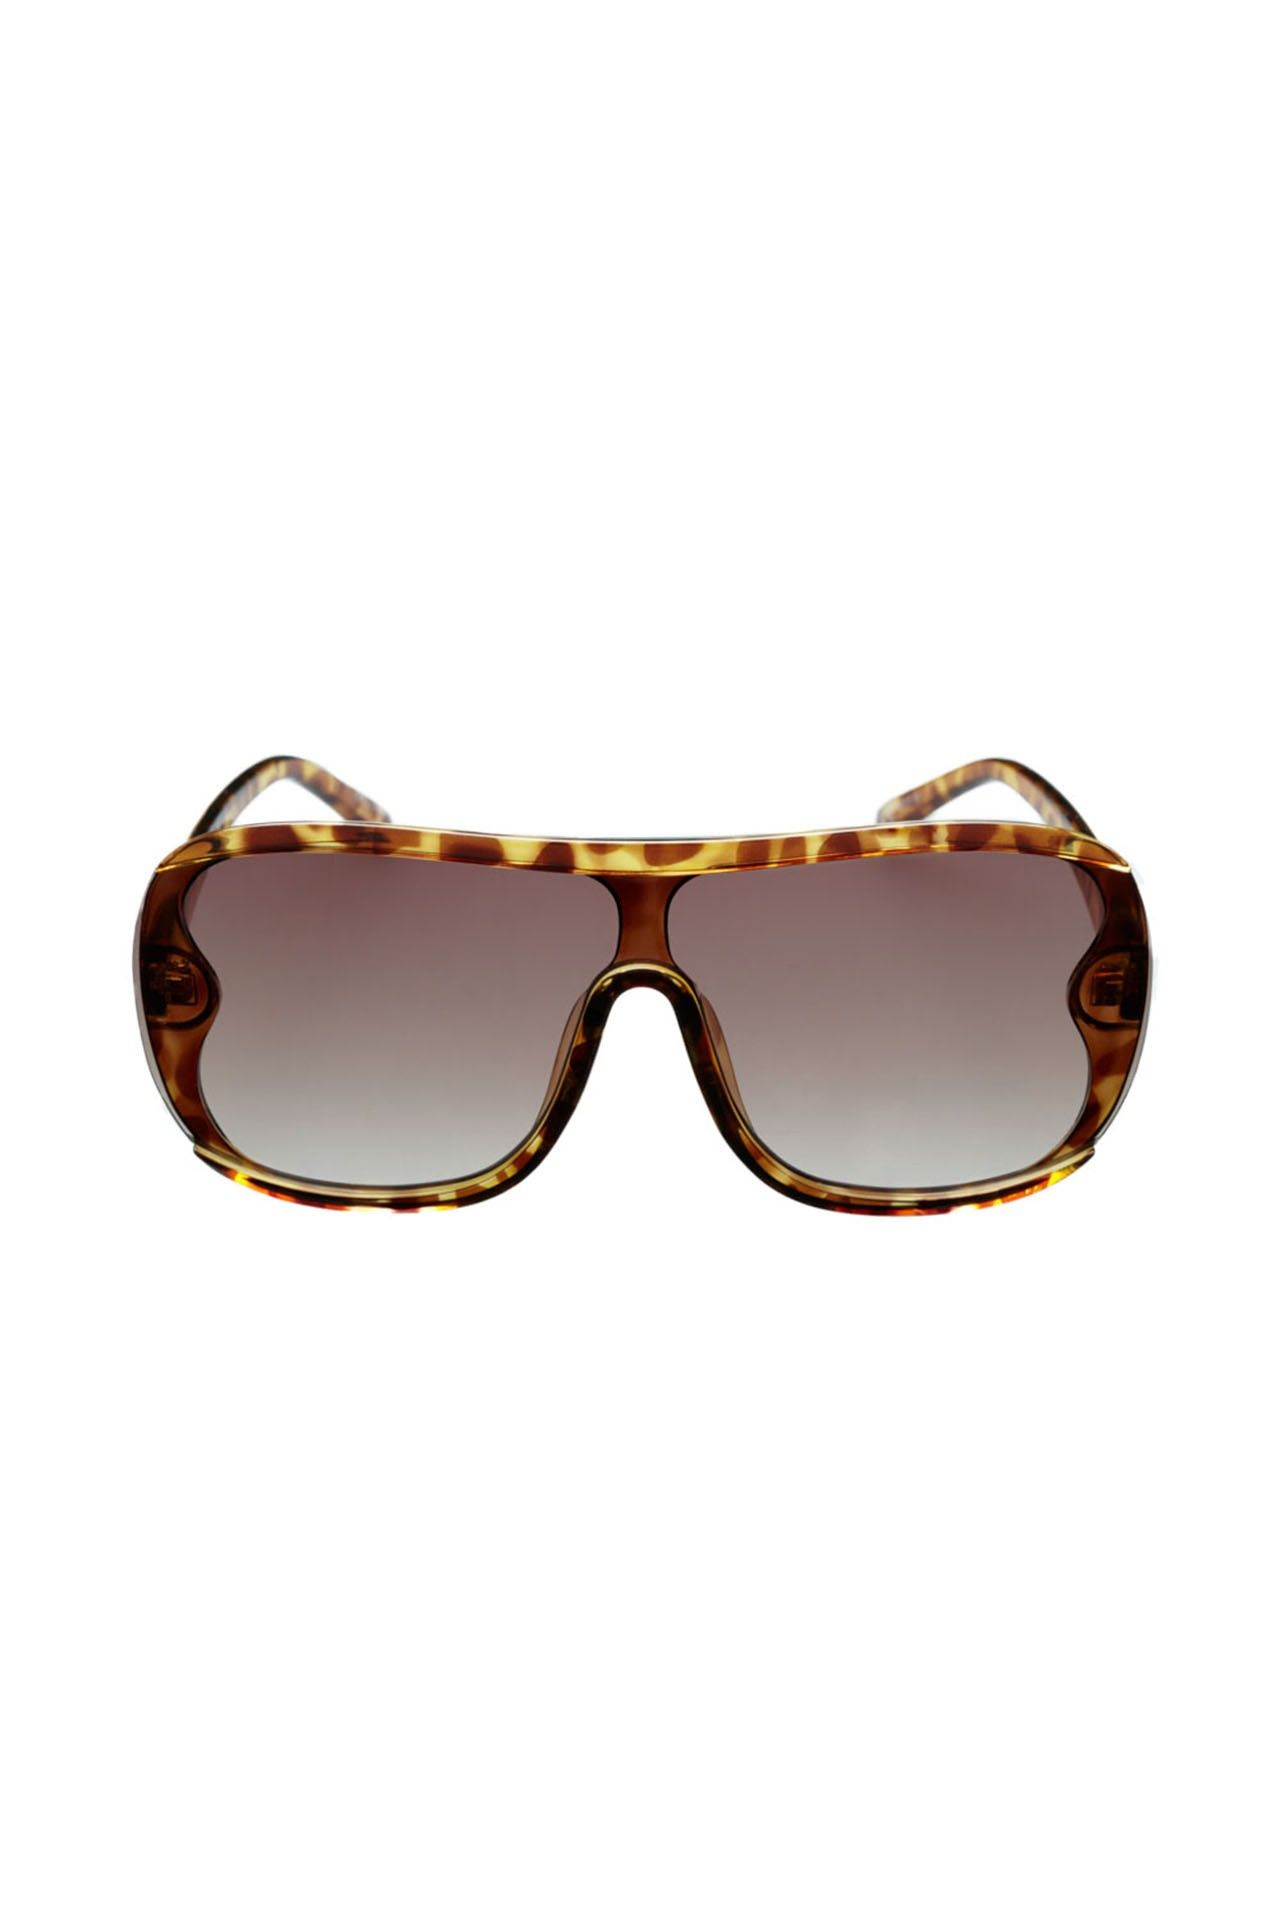 Afbeelding van Icon Eyewear Zonnebril 80117 Tort B